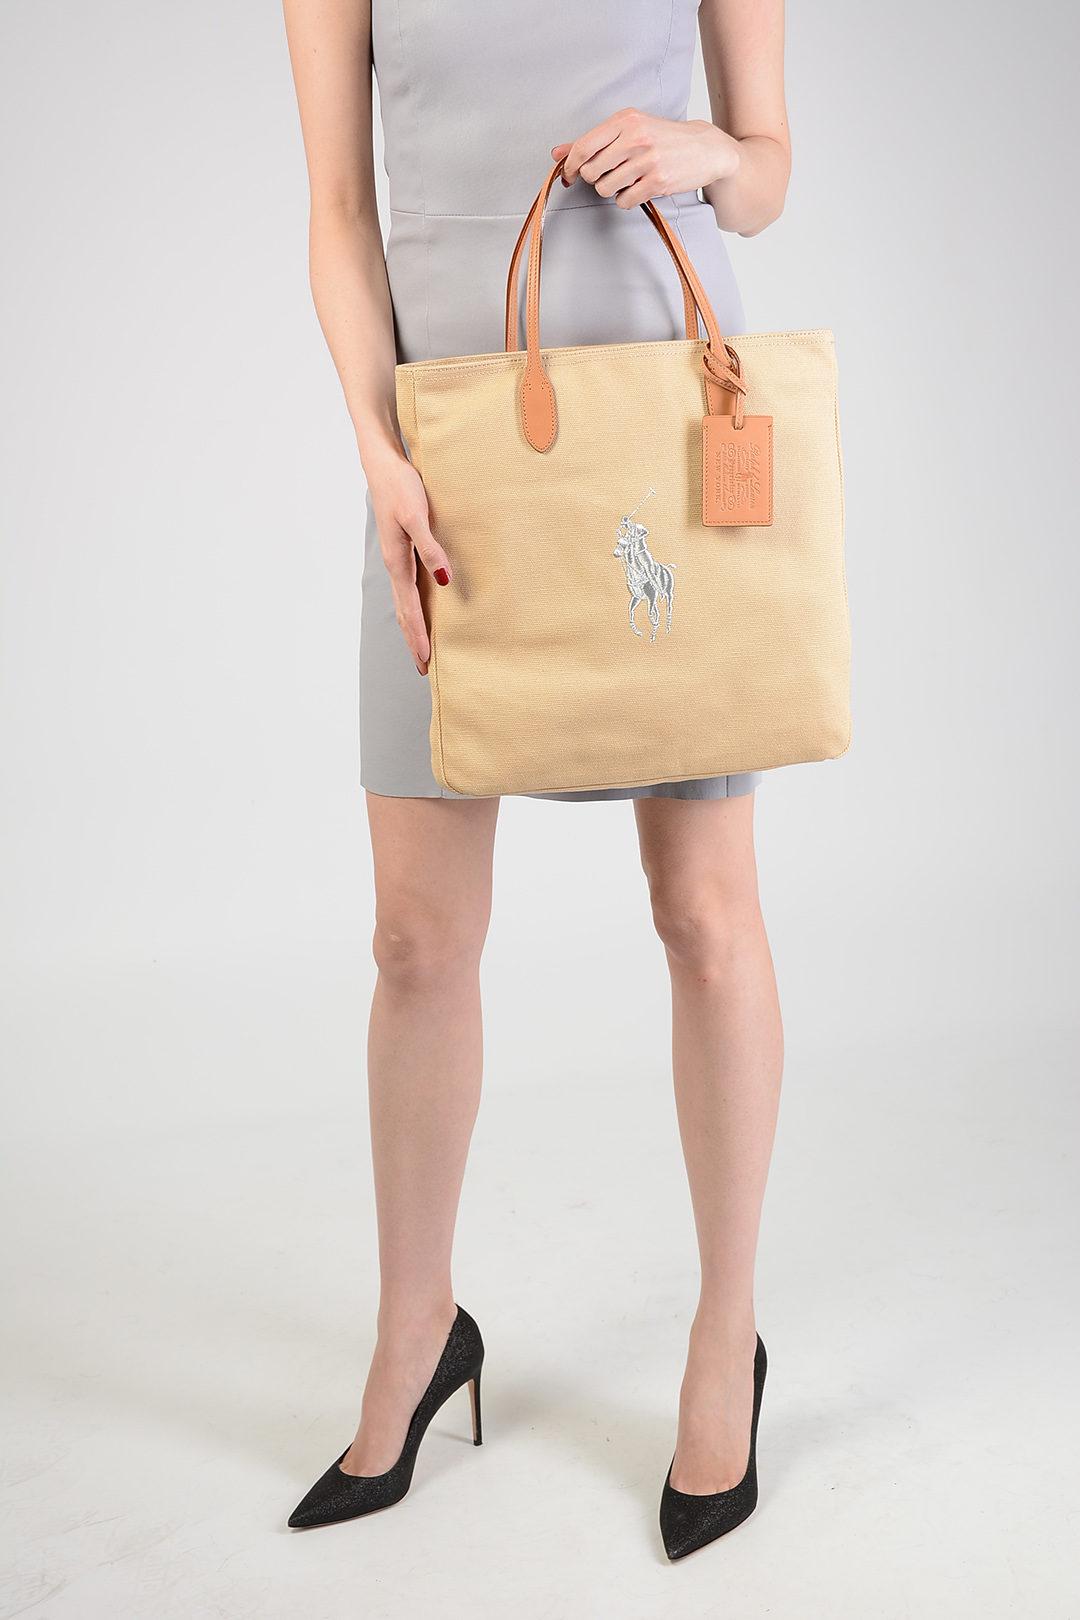 bf1da11d4f922 Borsa in Canvas Ralph Lauren donna - Cuoieria Shop On-line